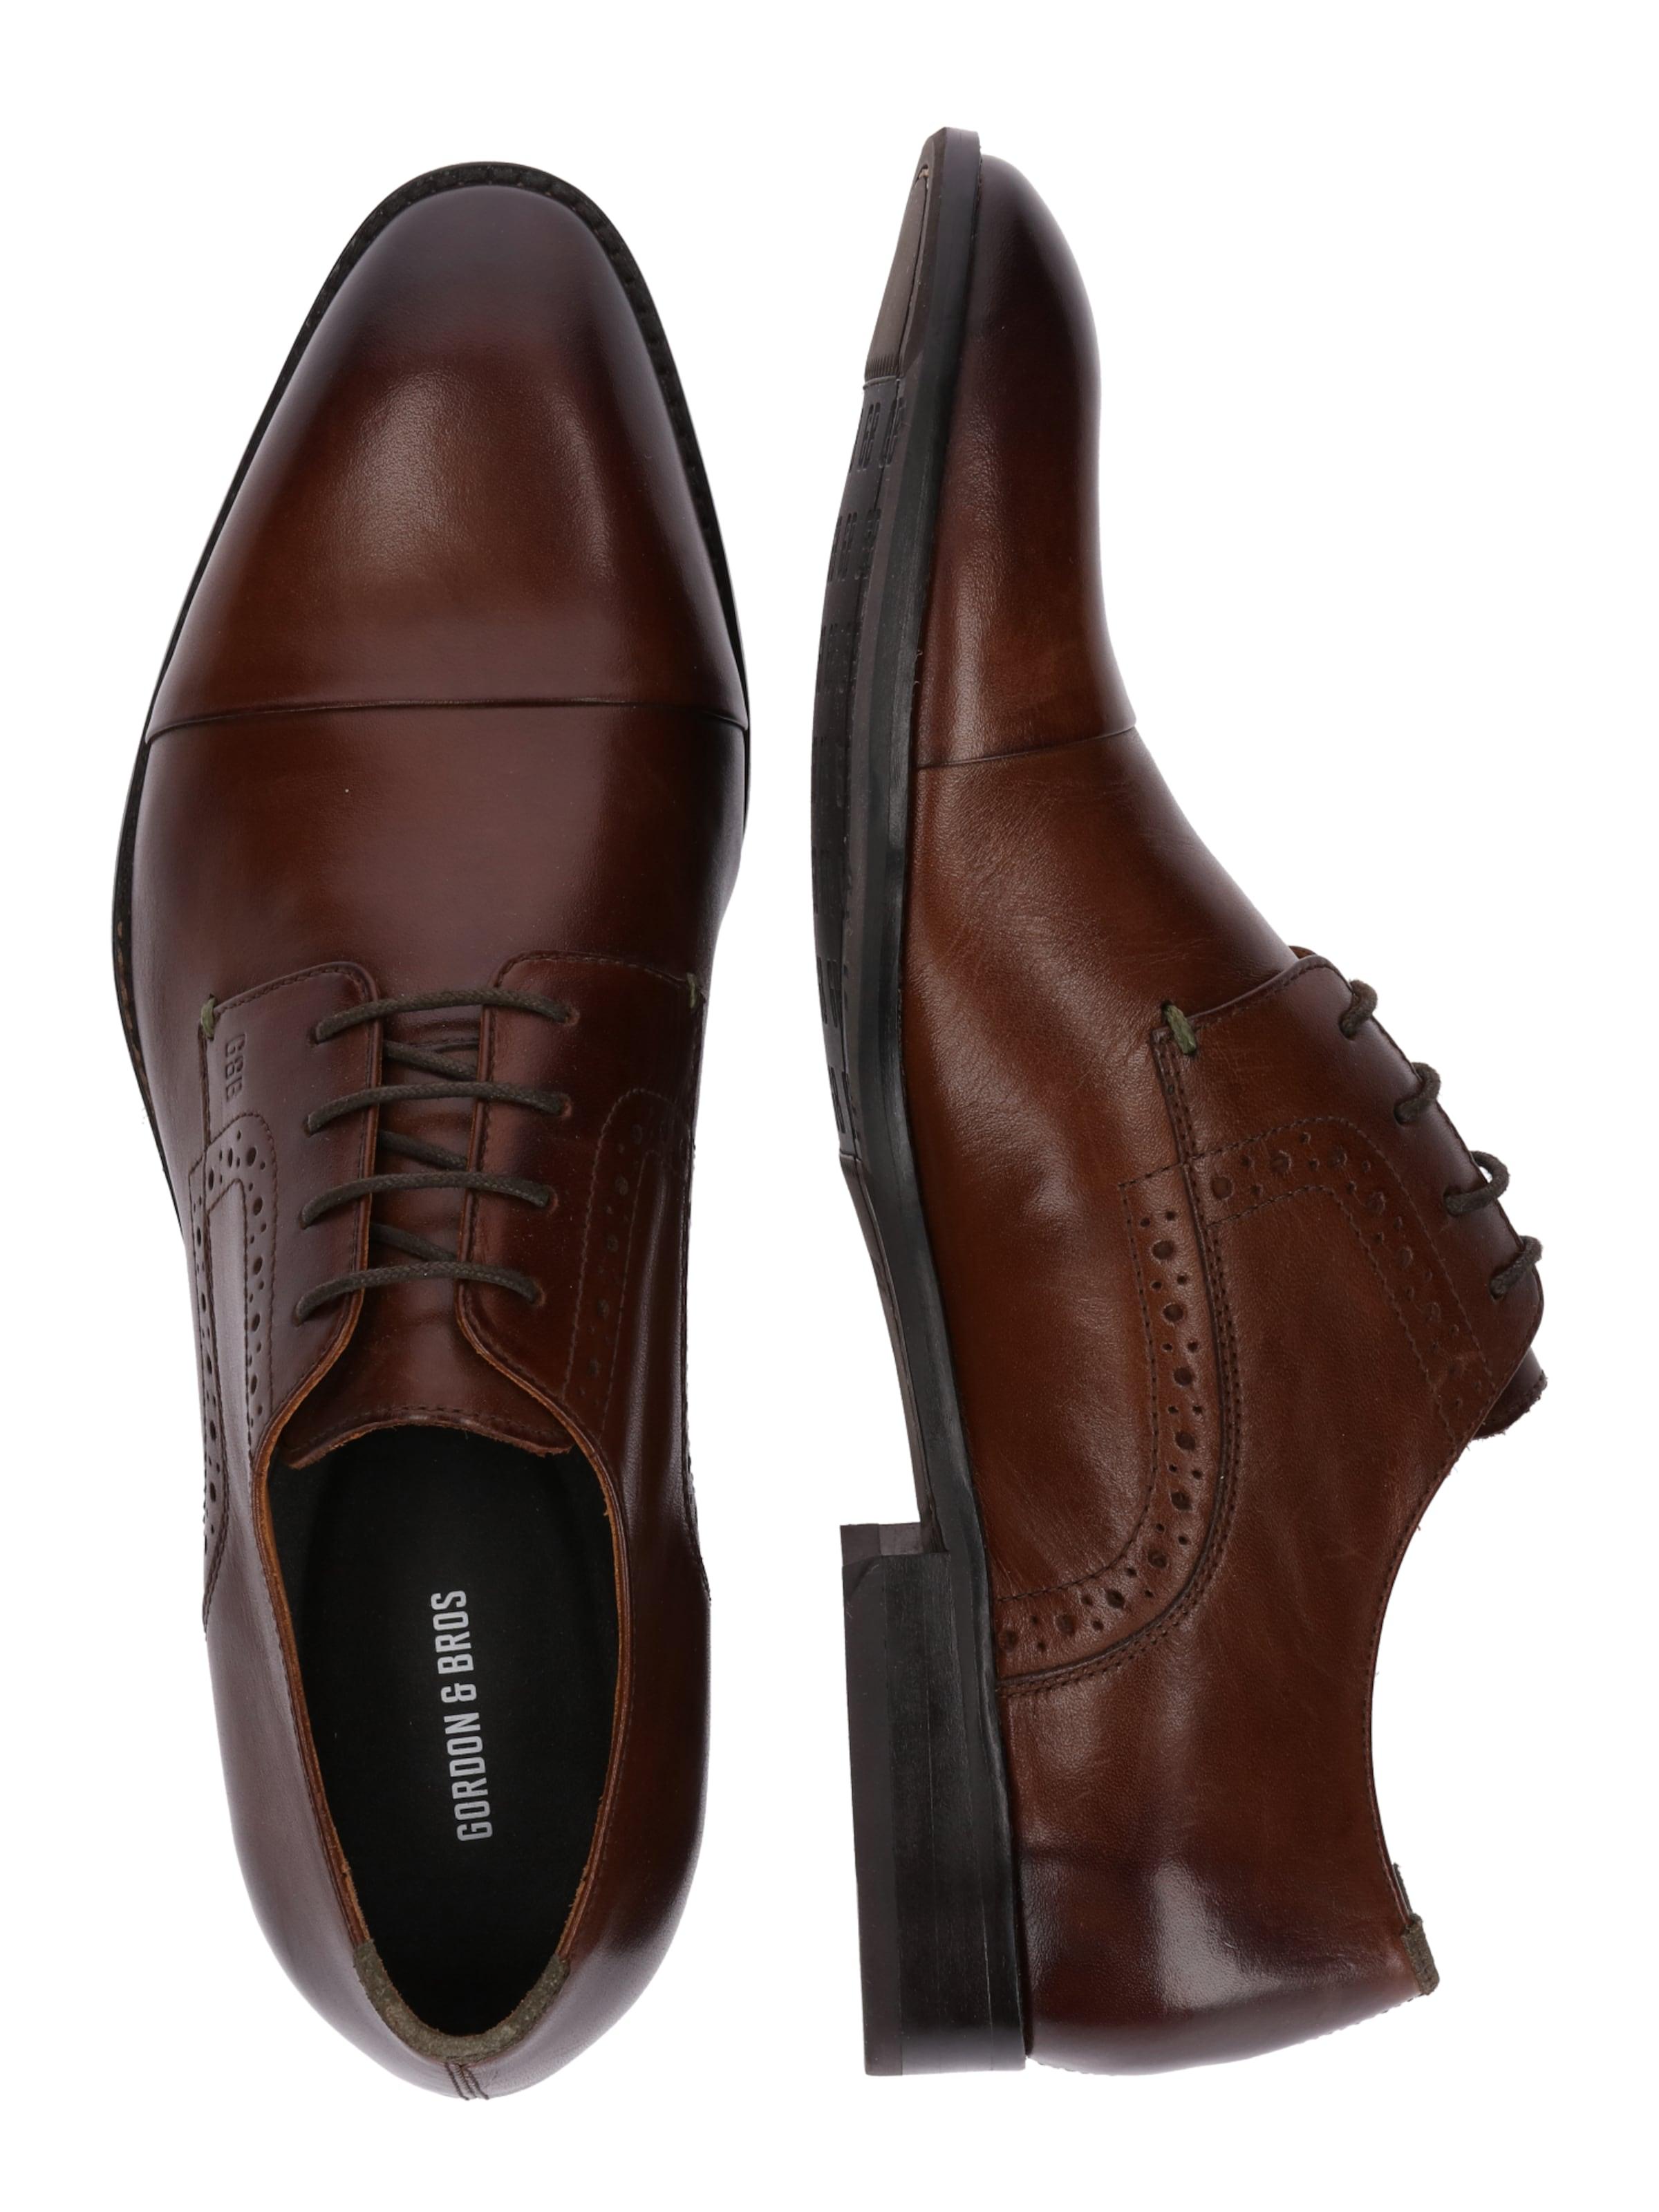 Chaussure Lacets 'mirco' Bros Gordonamp; En À Foncé Brun PO0w8nXk